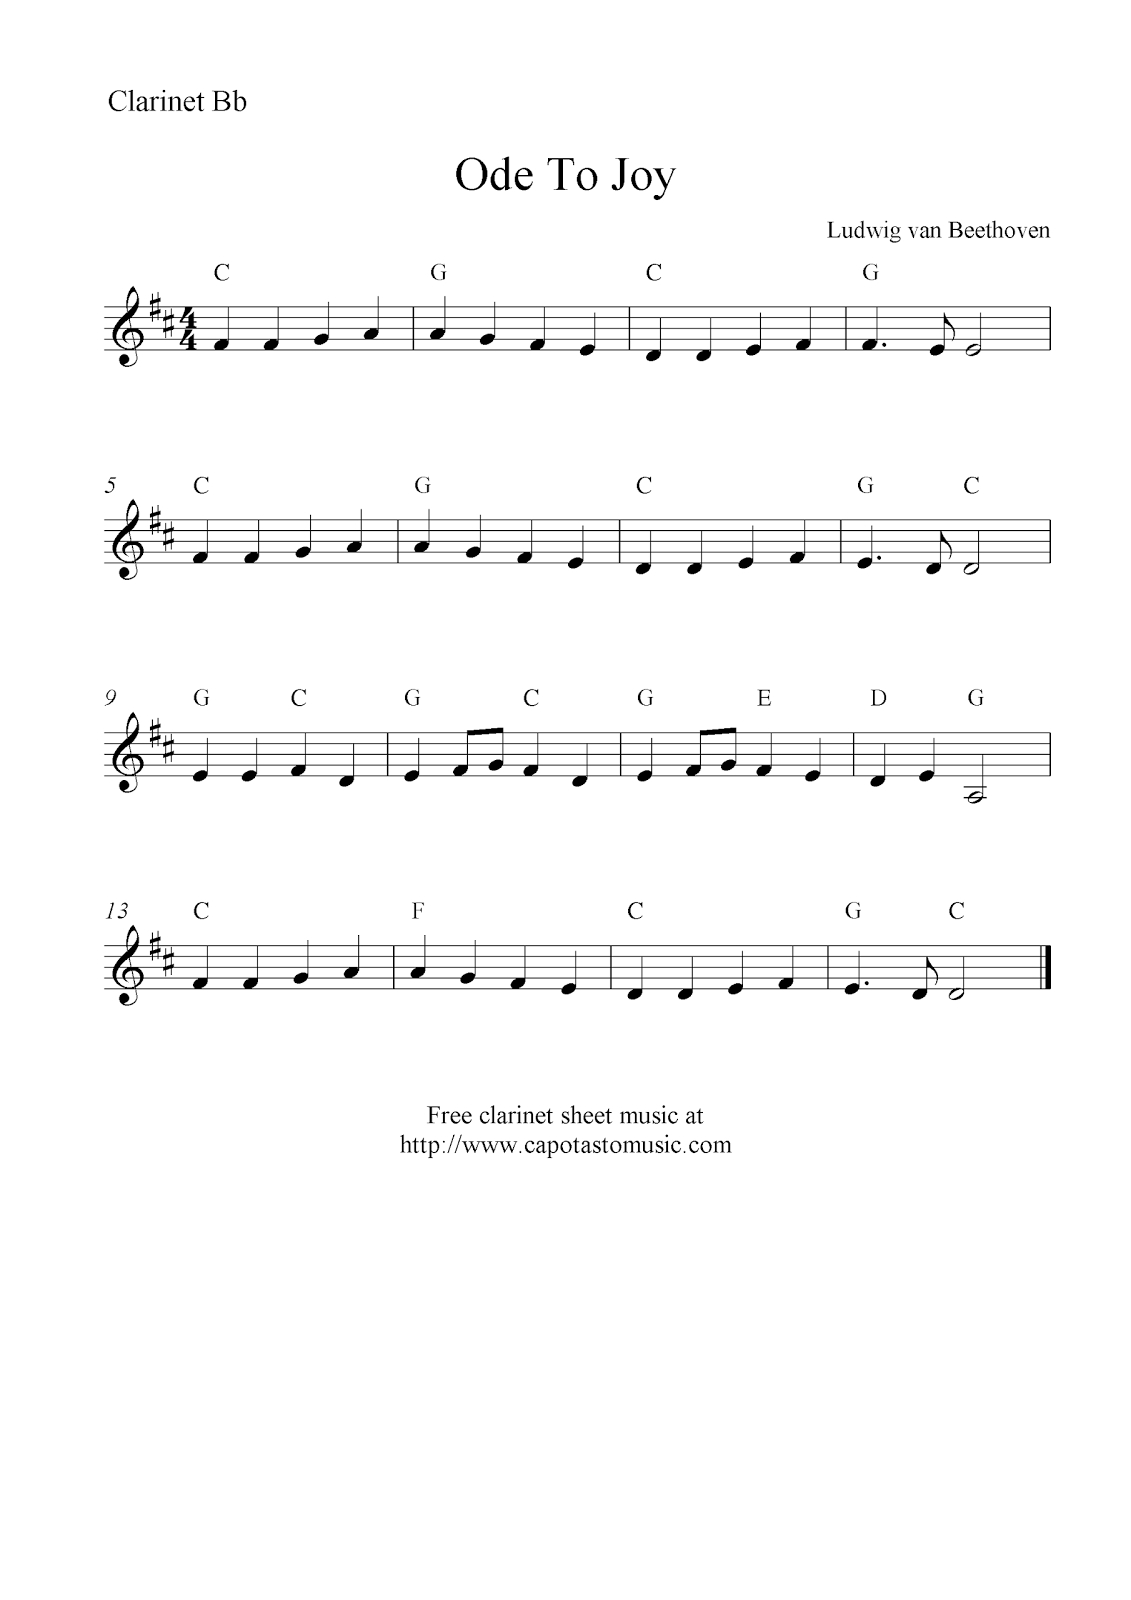 Ode To Joybeethoven, Free Clarinet Sheet Music Notes - Free Printable Clarinet Music